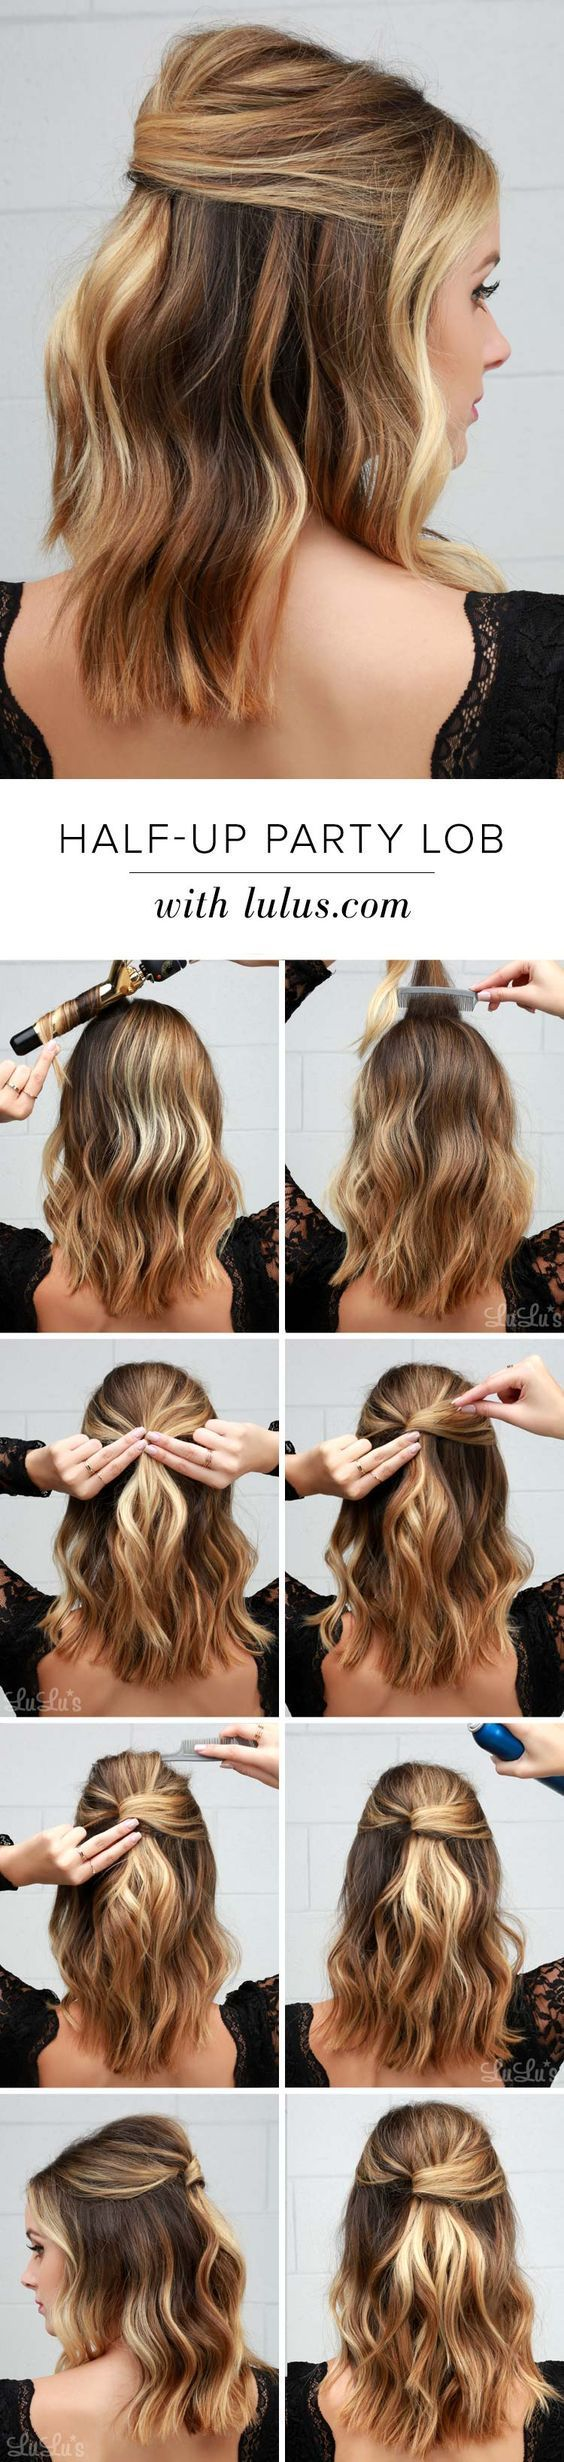 Easy Half Up Half Down Hairstyles Half Up Party Lob Hair Styles Long Hair Styles Medium Hair Styles